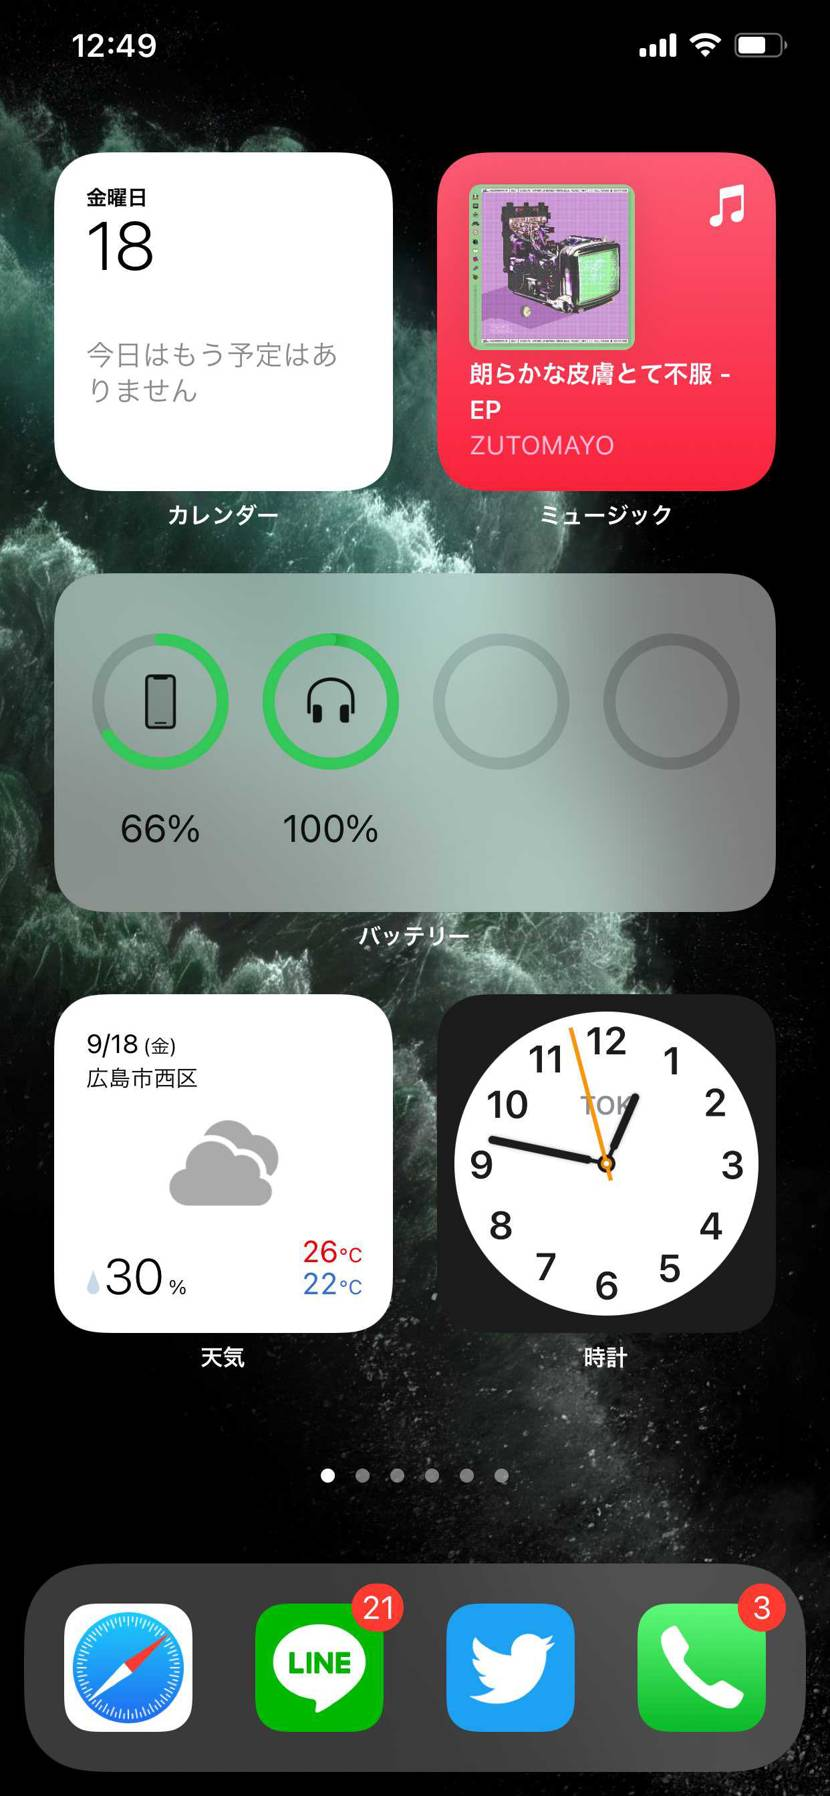 ios14でスニーカー系のアプリ開かなくなるか心配な人向けに